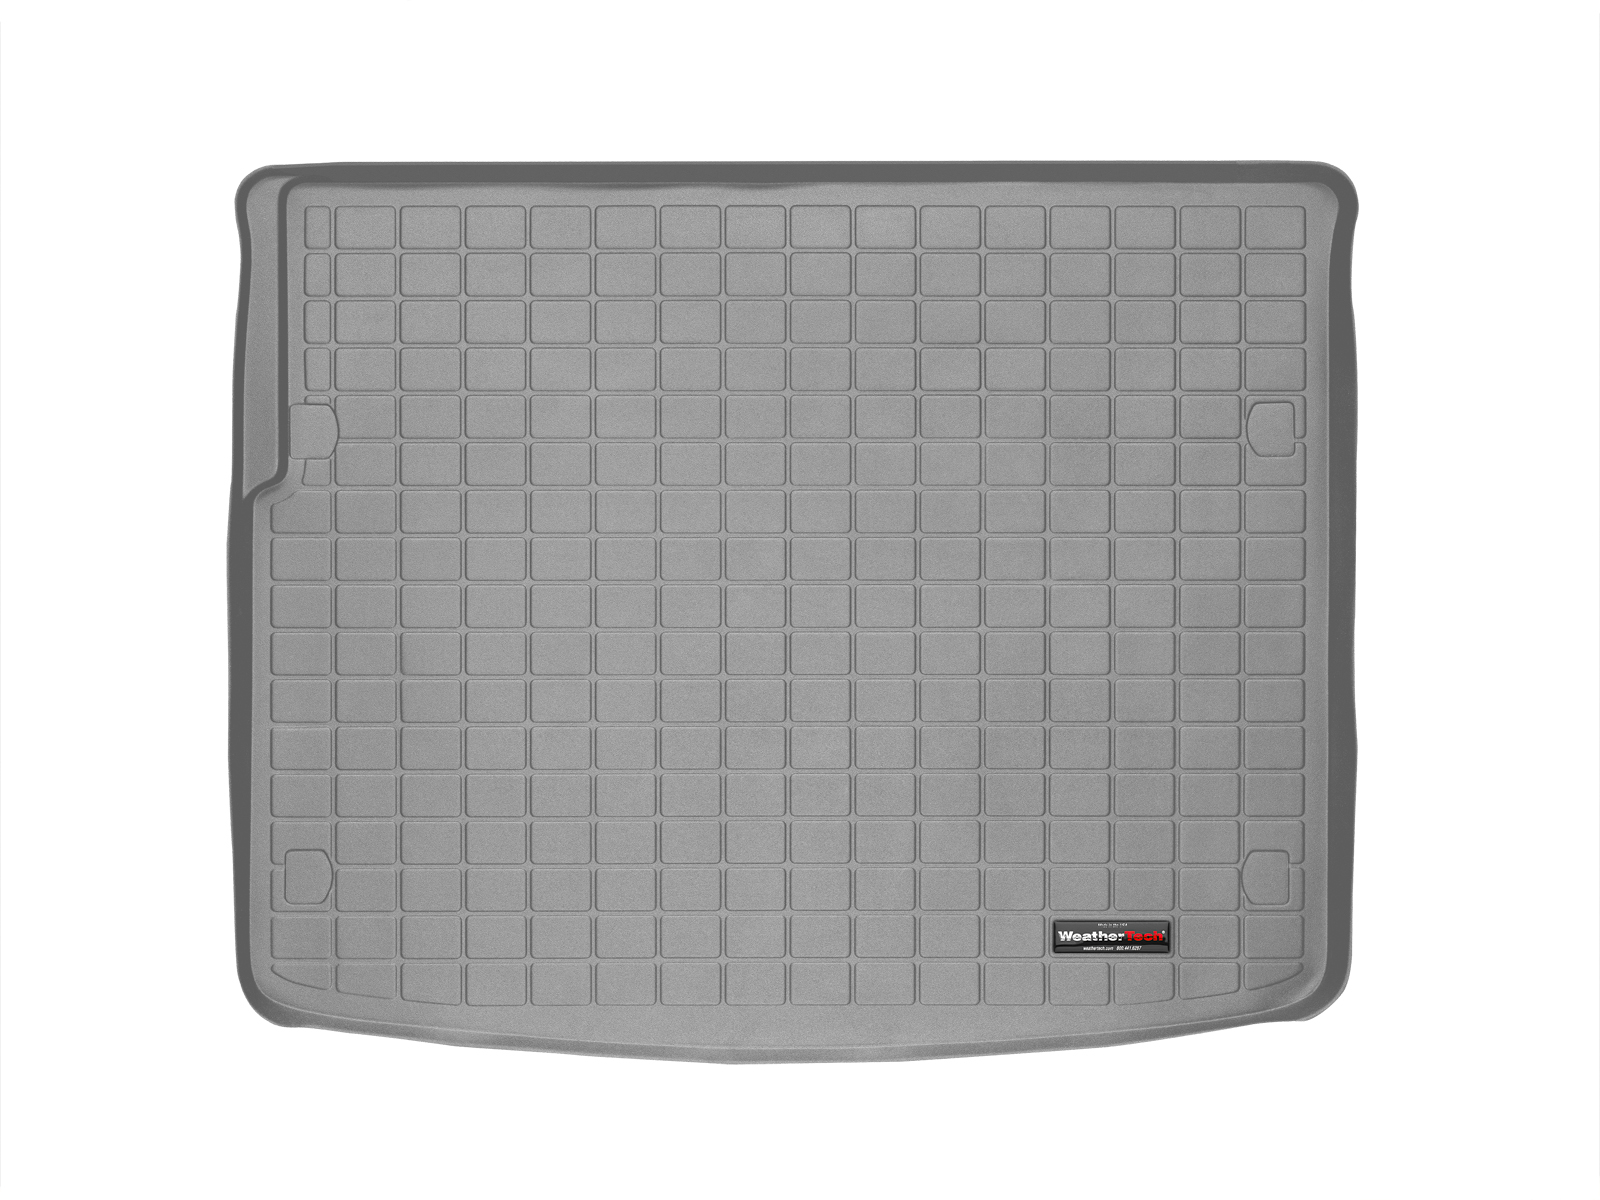 Volkswagen Touareg 2010>2010 Vasca baule tappeto bagagliaio grigio *1429